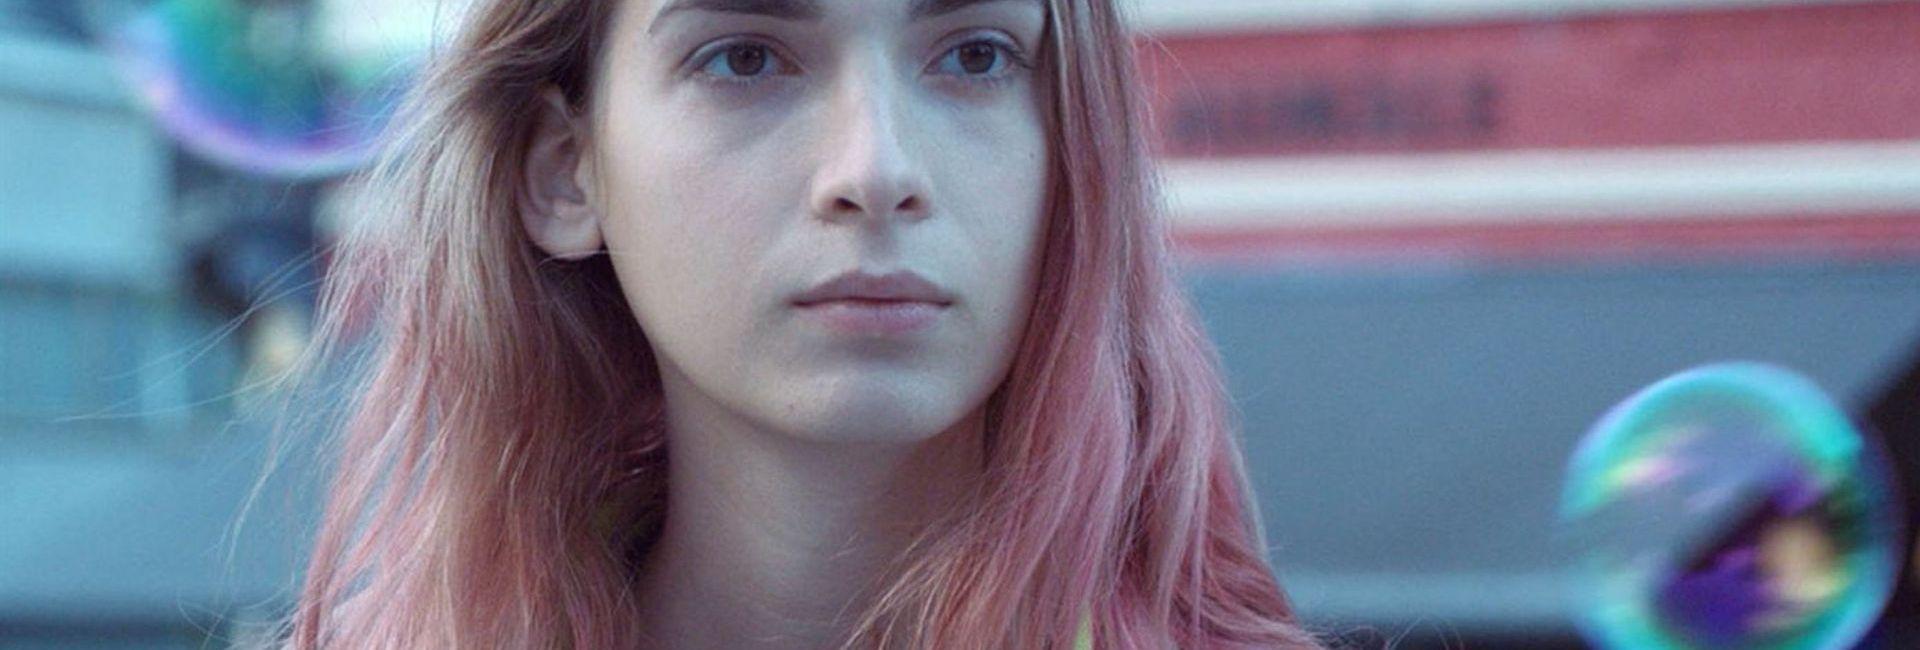 mya bollaers dans le film Lola vers la mer